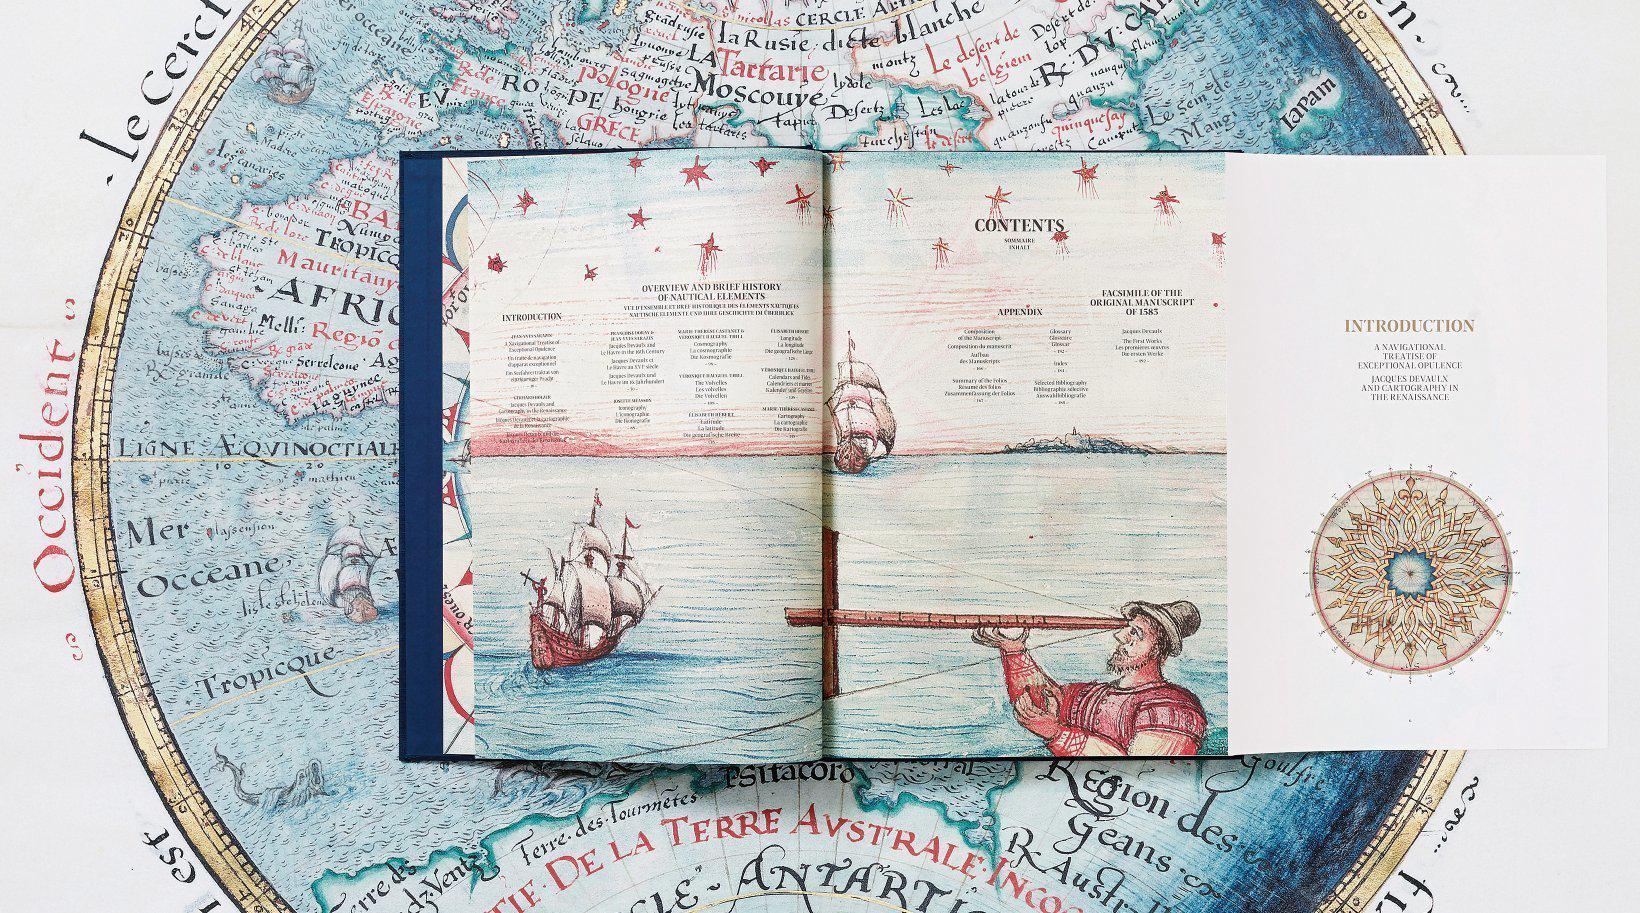 Jacques Devaulx Nautical Works